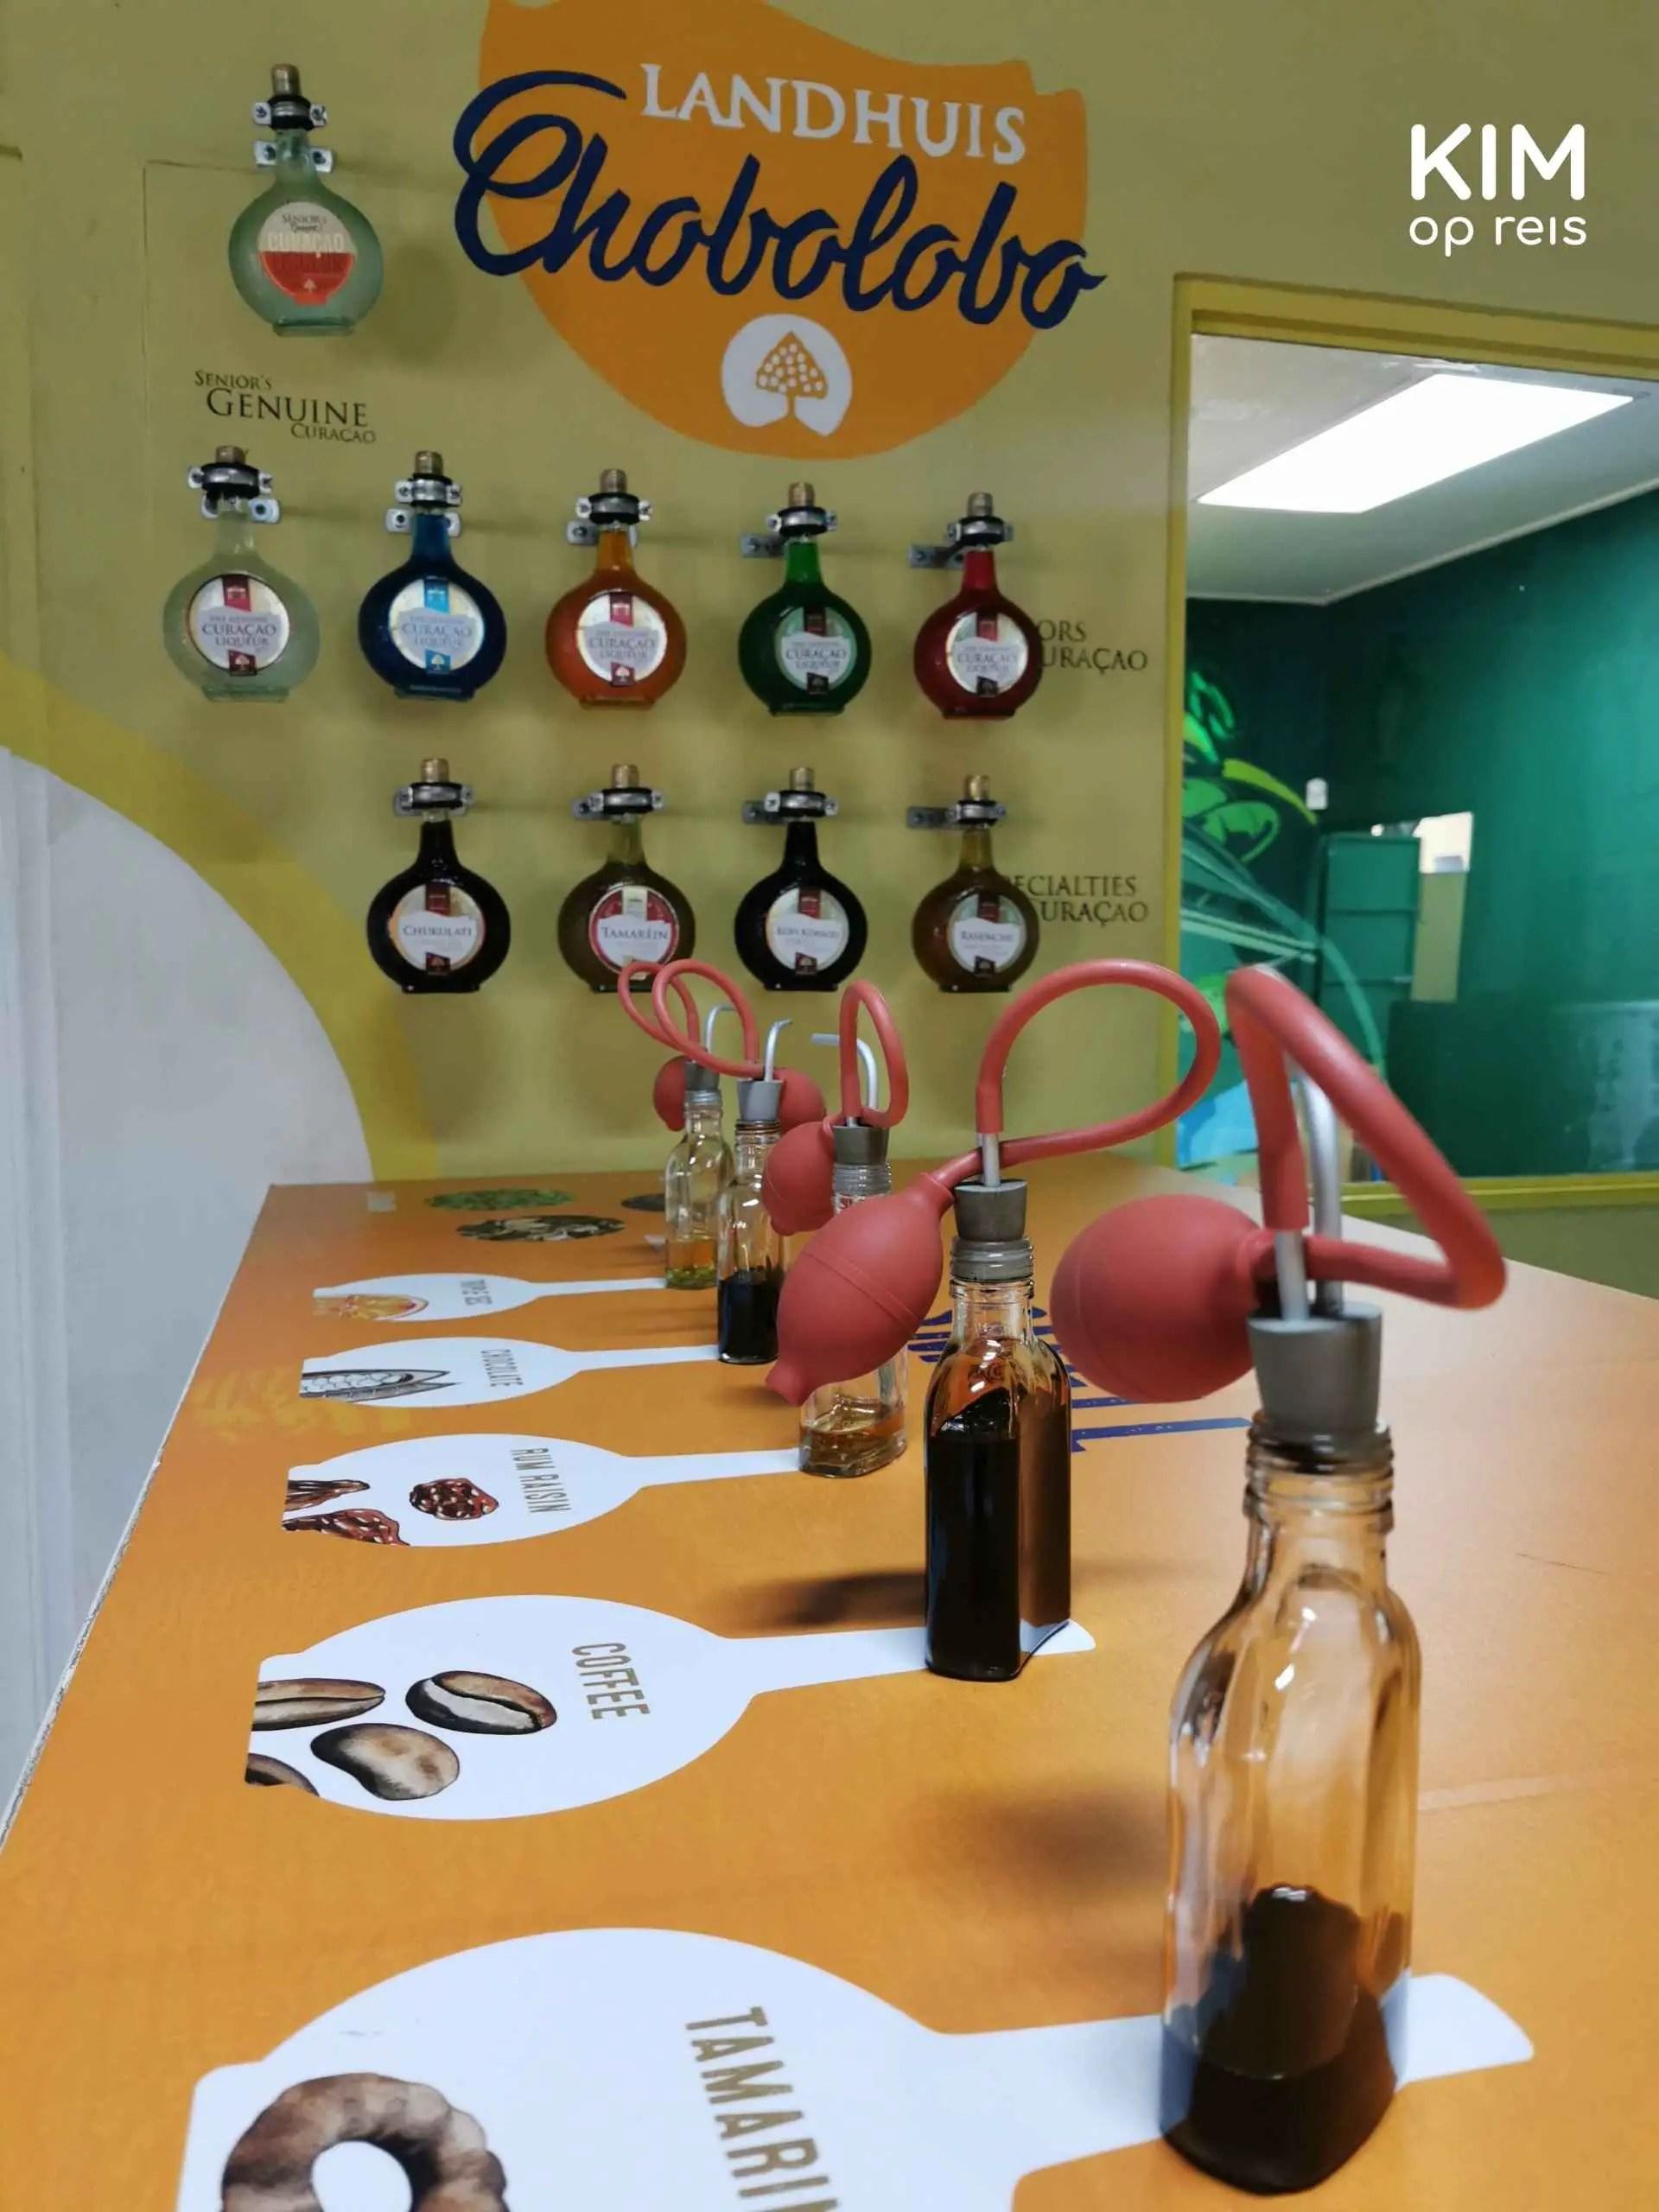 Chobolobo landhuis Blue Curaçao: geurverspreiders en flessen Blue Curaçao aan de muur